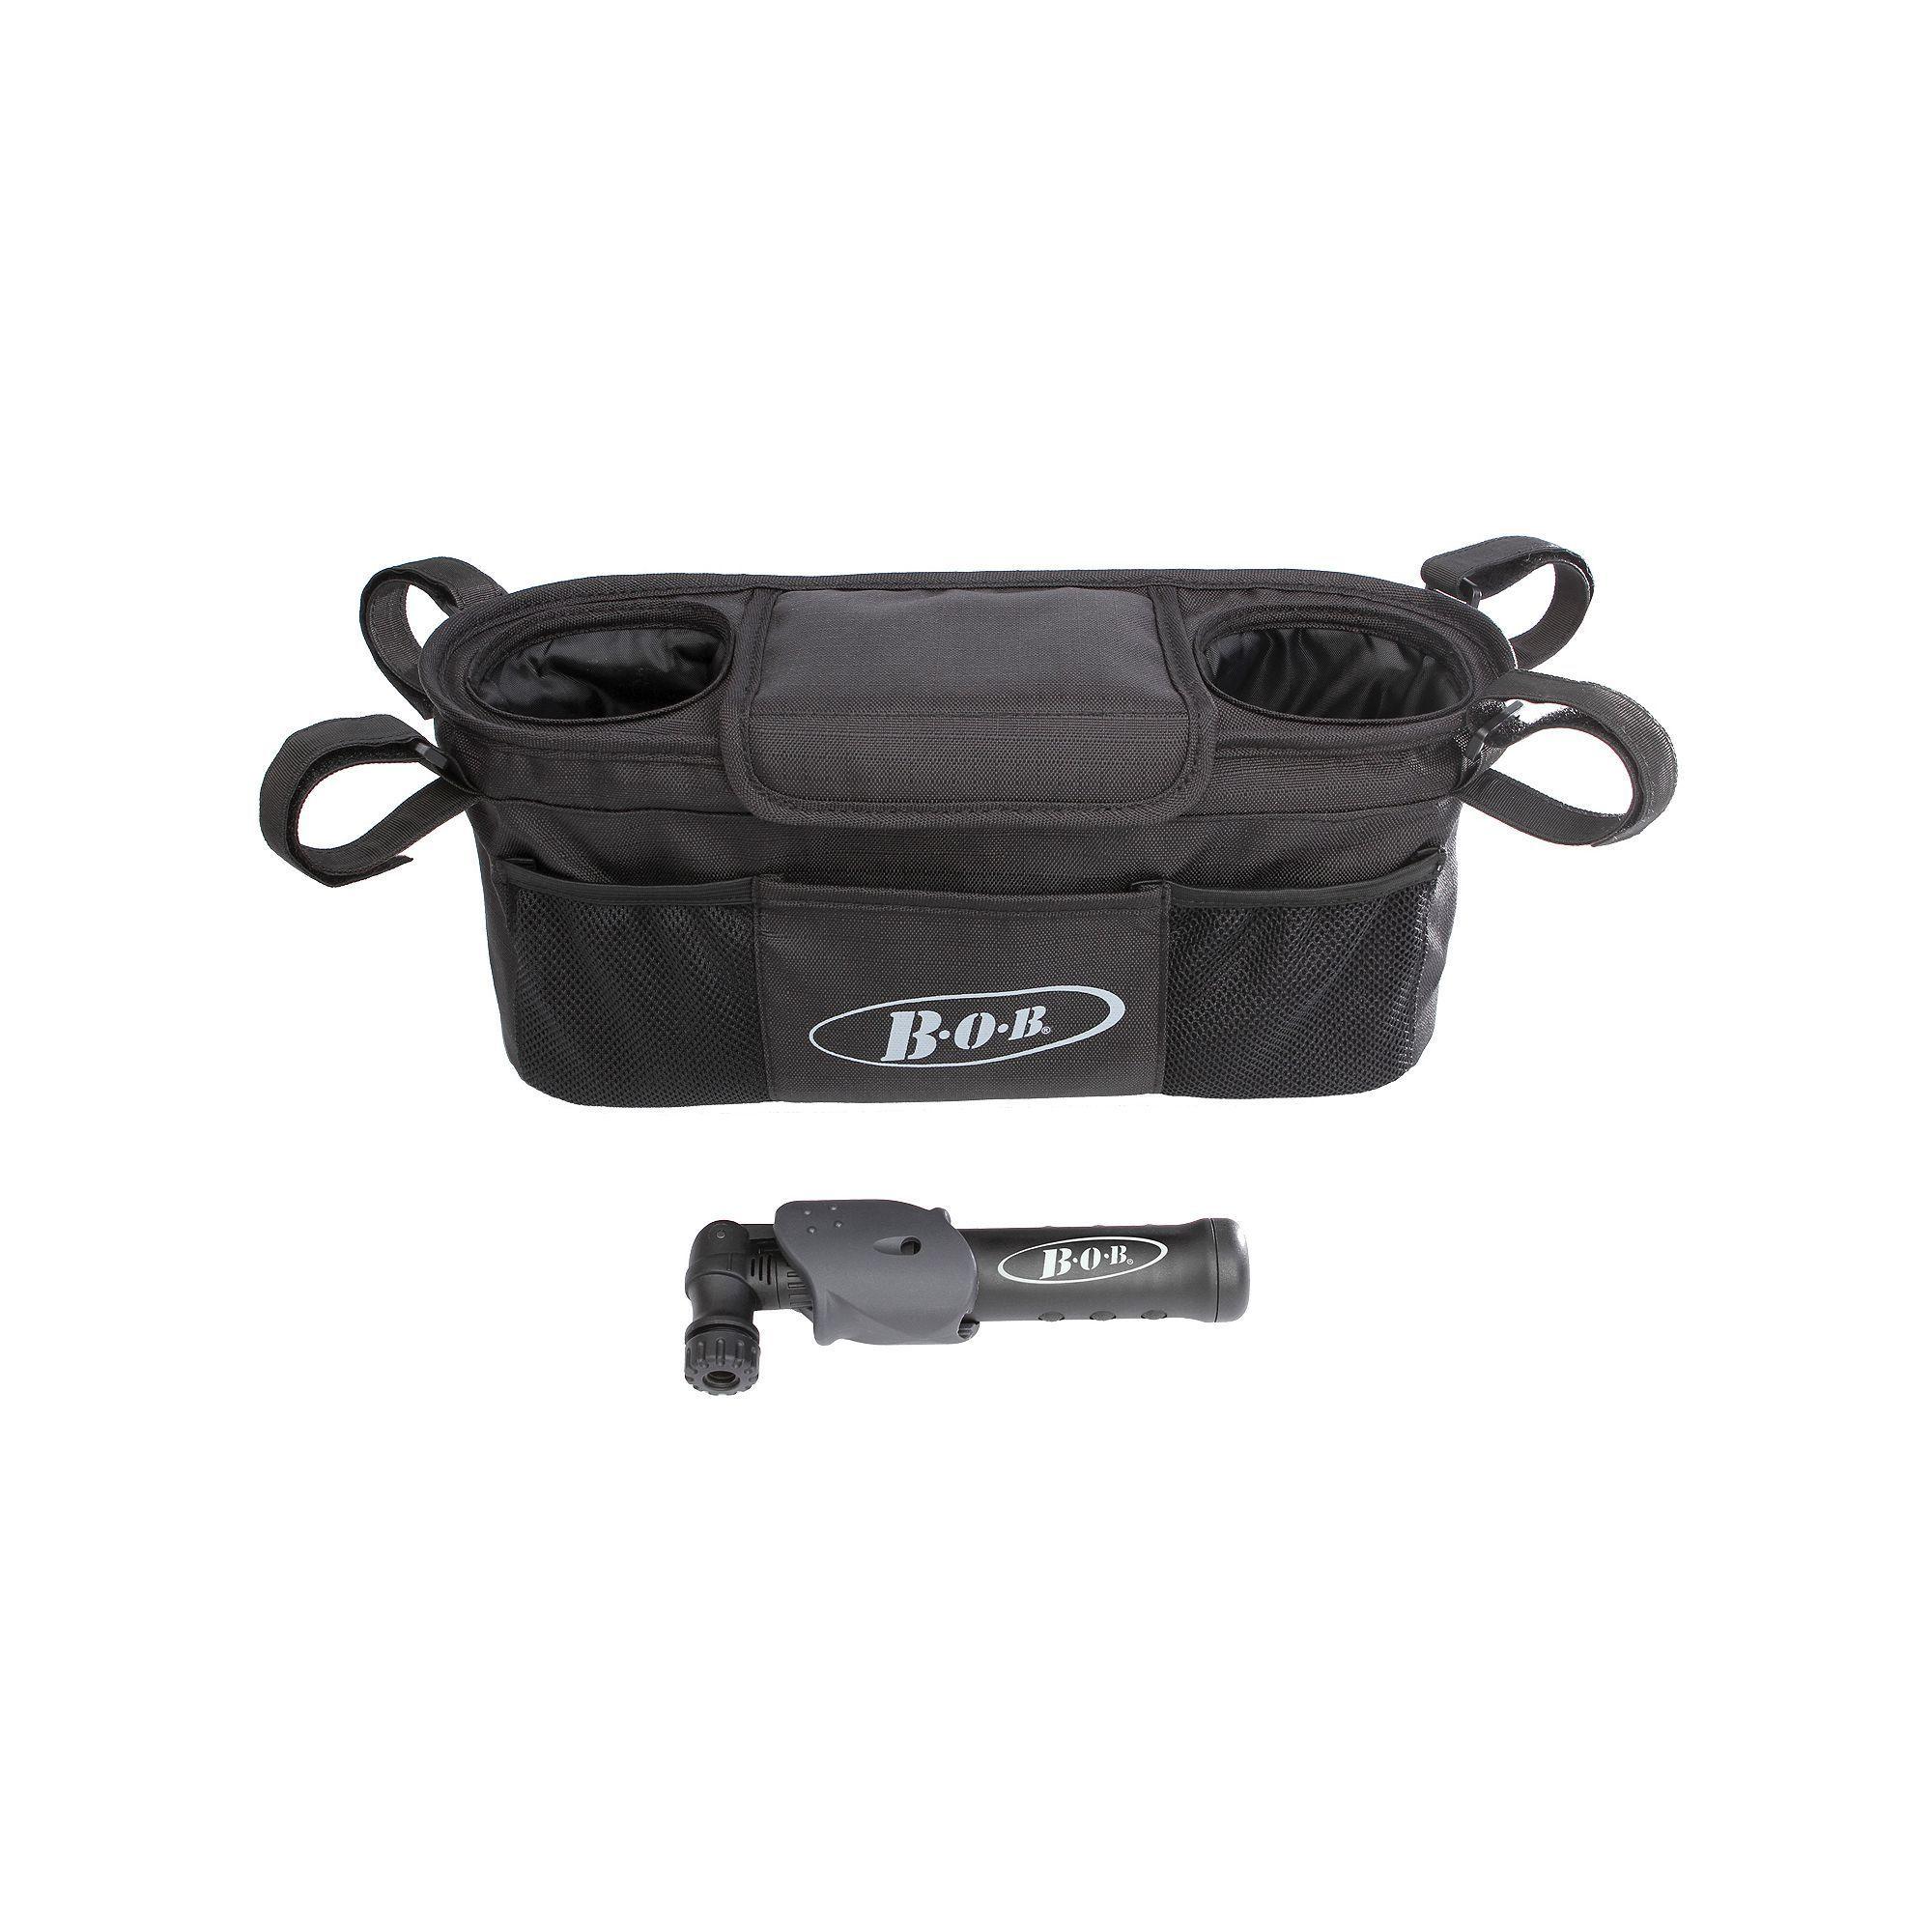 BOB Handlebar Console & Tire Pump Set Bob stroller